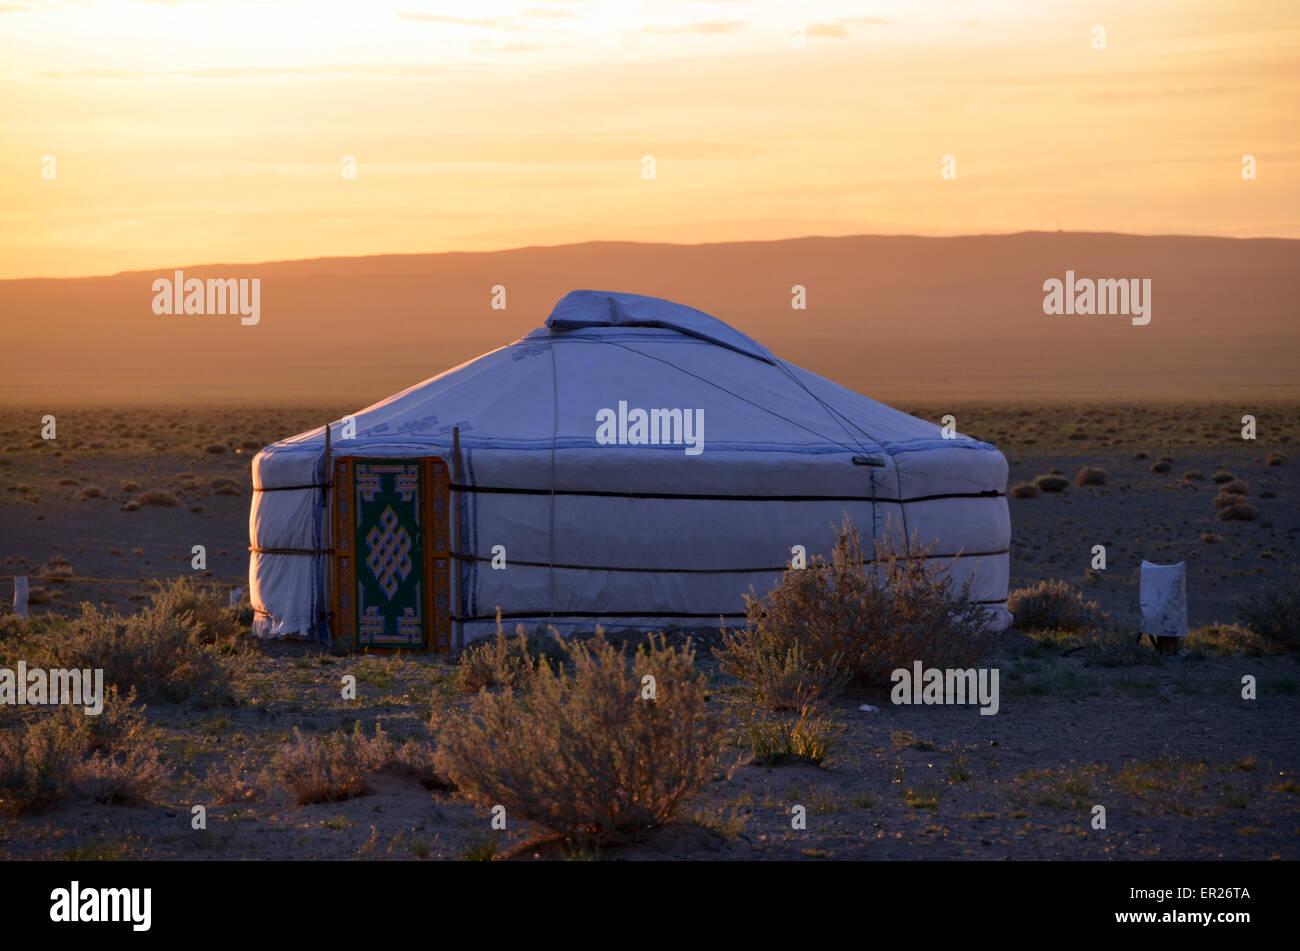 A yurt in the Gobi desert near the Khongoryn sand dunes, Omnogovi province, southern Mongolia. Stock Photo